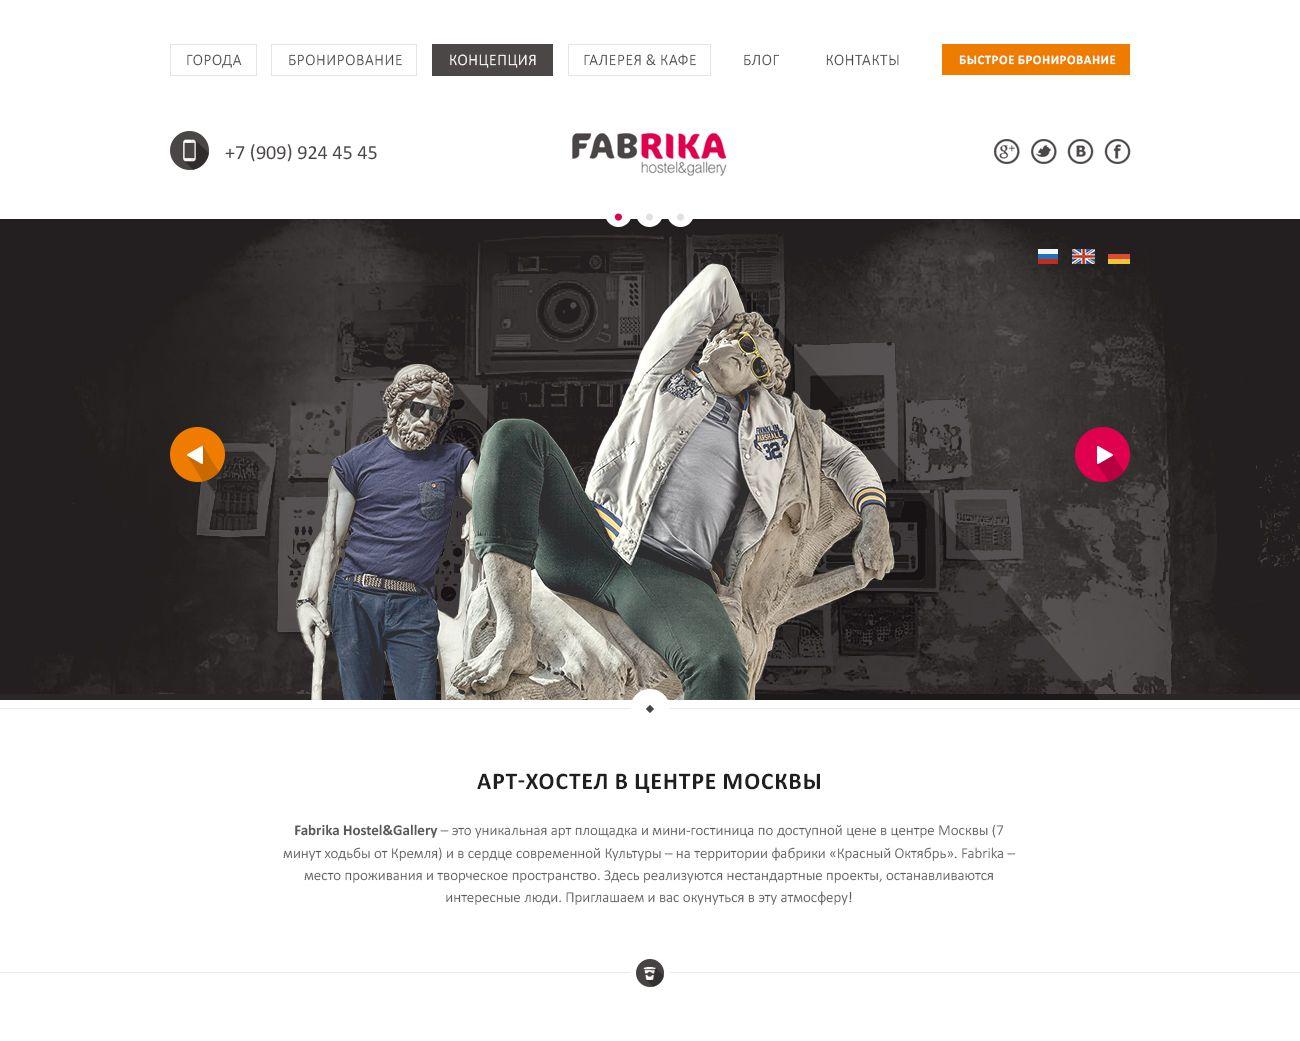 Разработка сайта арт пространства - дизайнер Staierchest